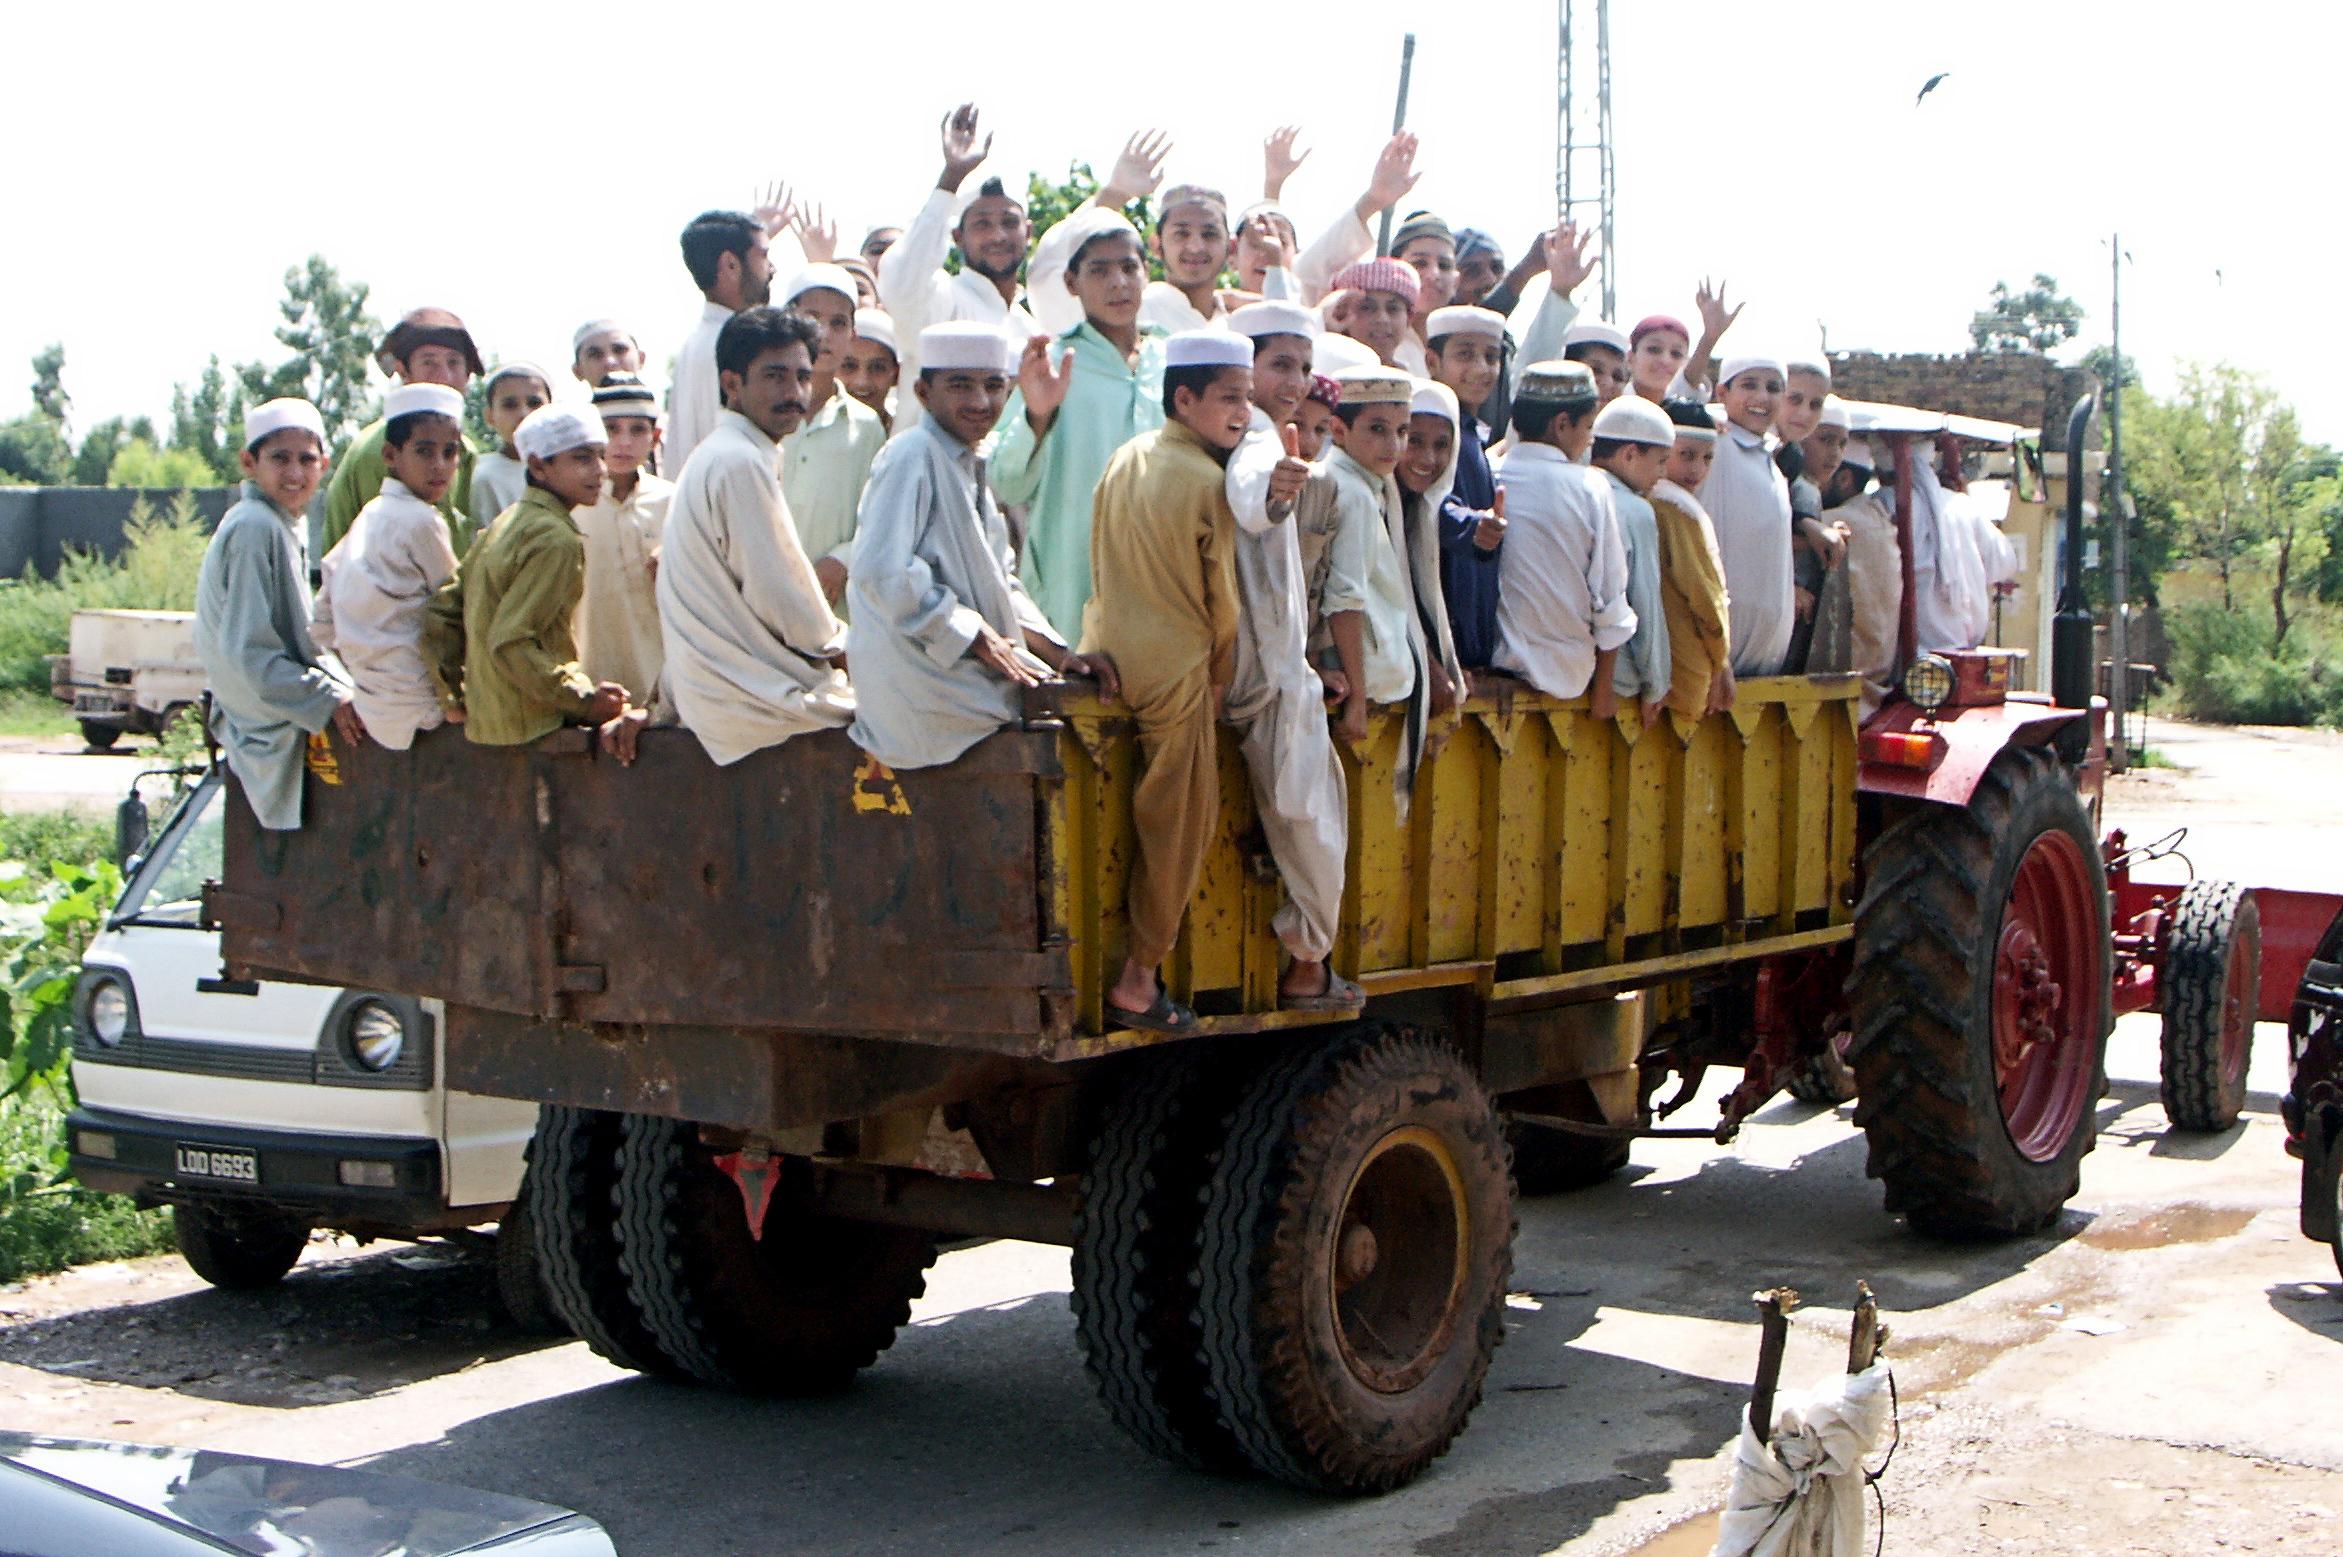 054 PB Madrassa students.jpg